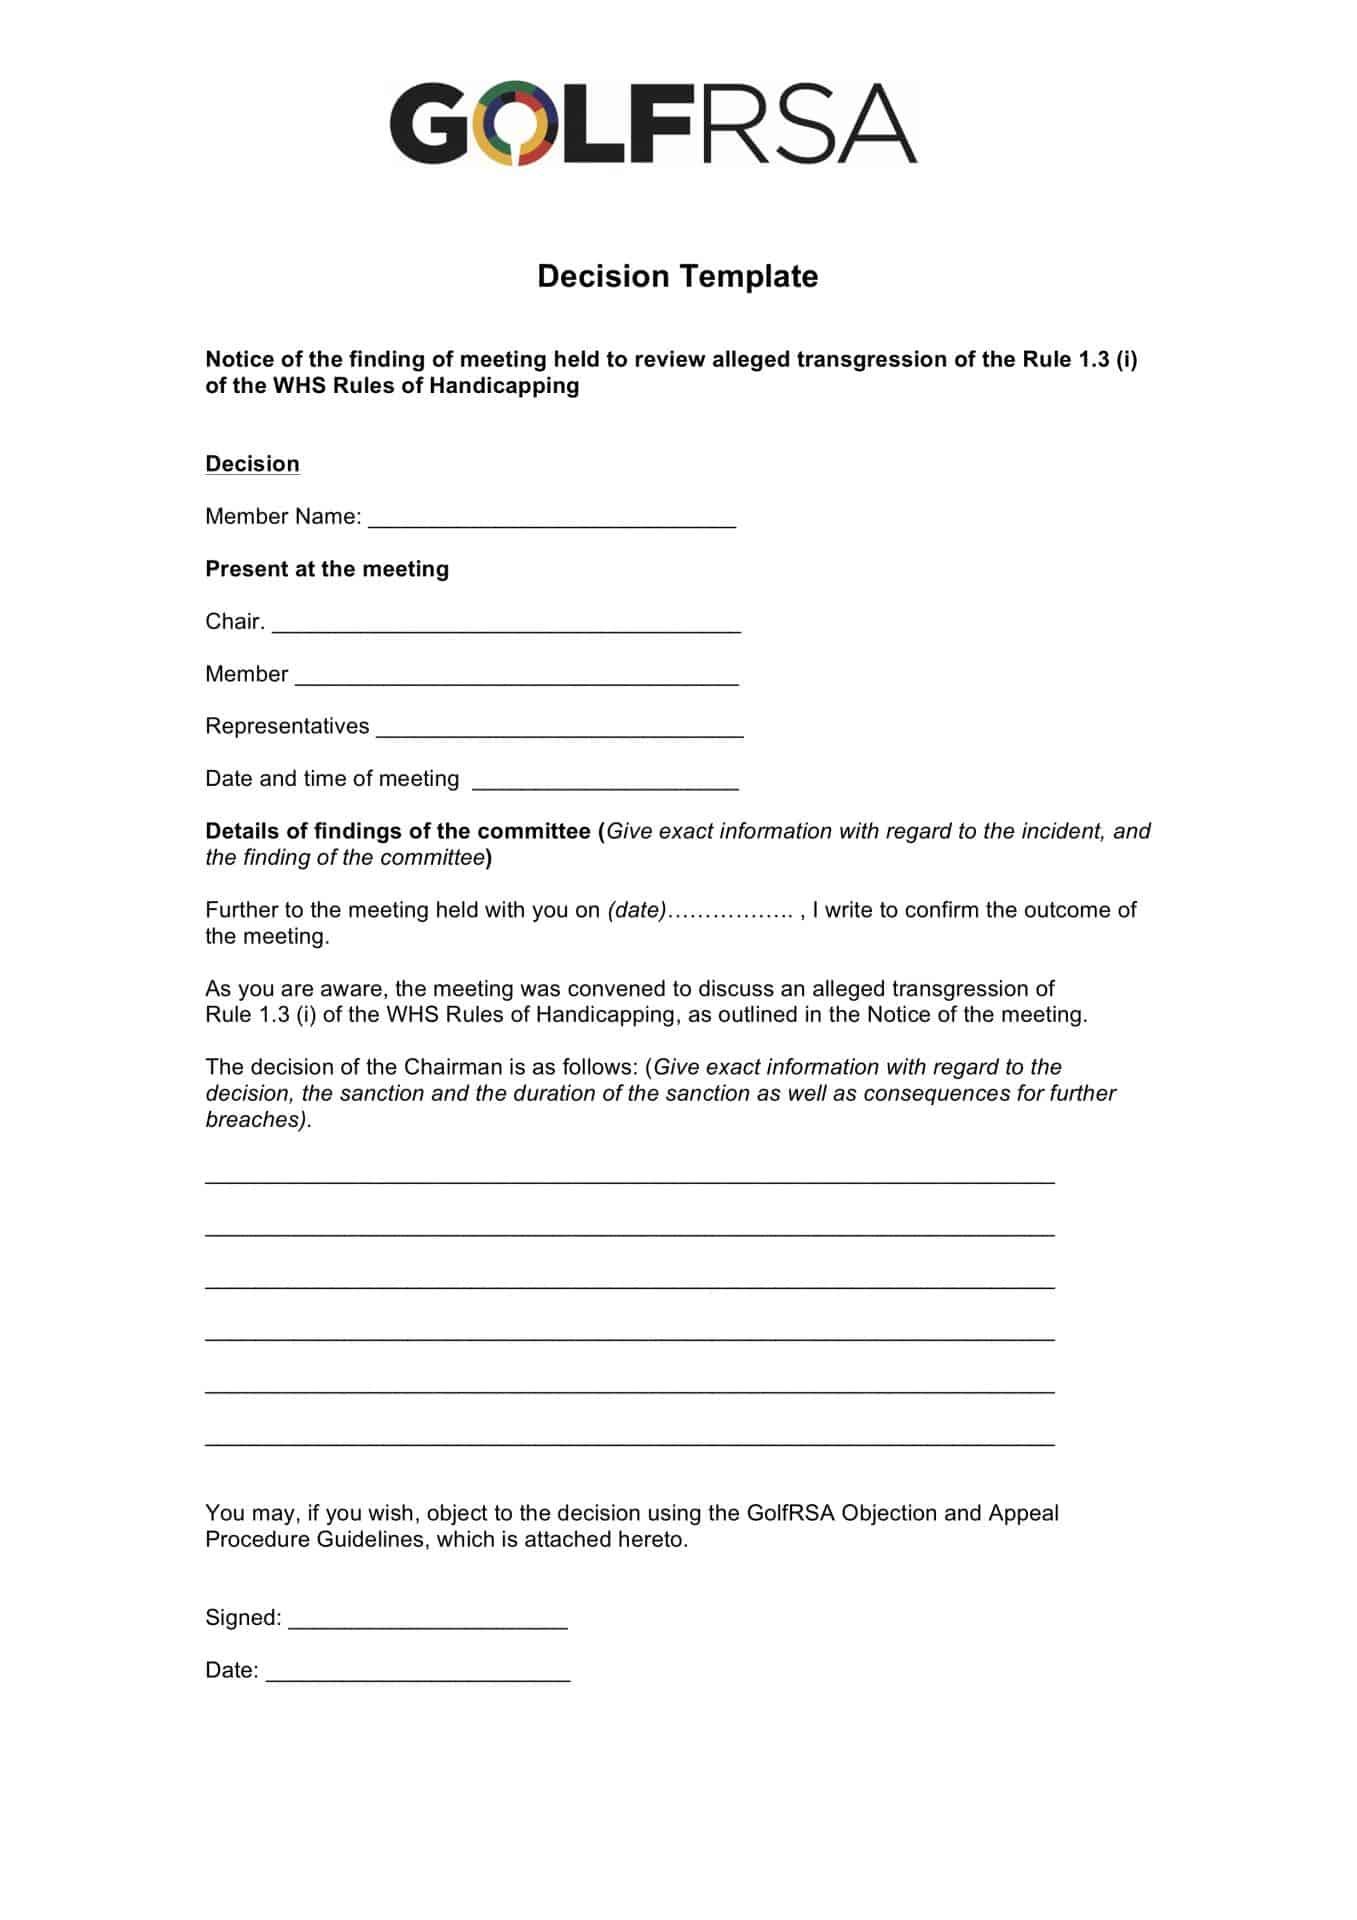 GolfRSA Decision template